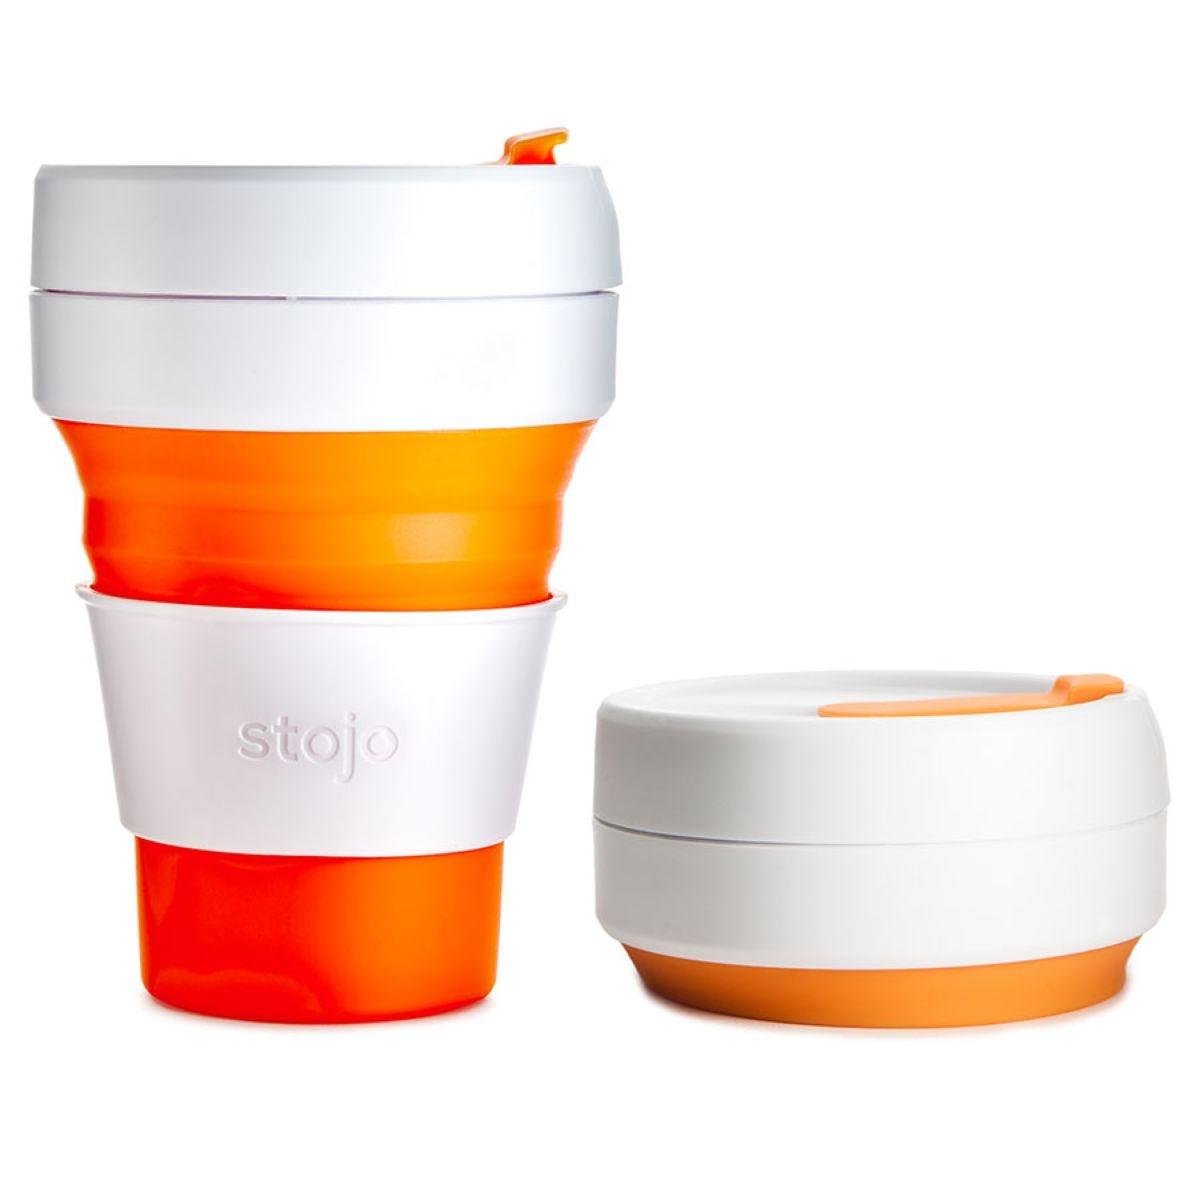 Stojo Collapsible Pocket Cup - Orange